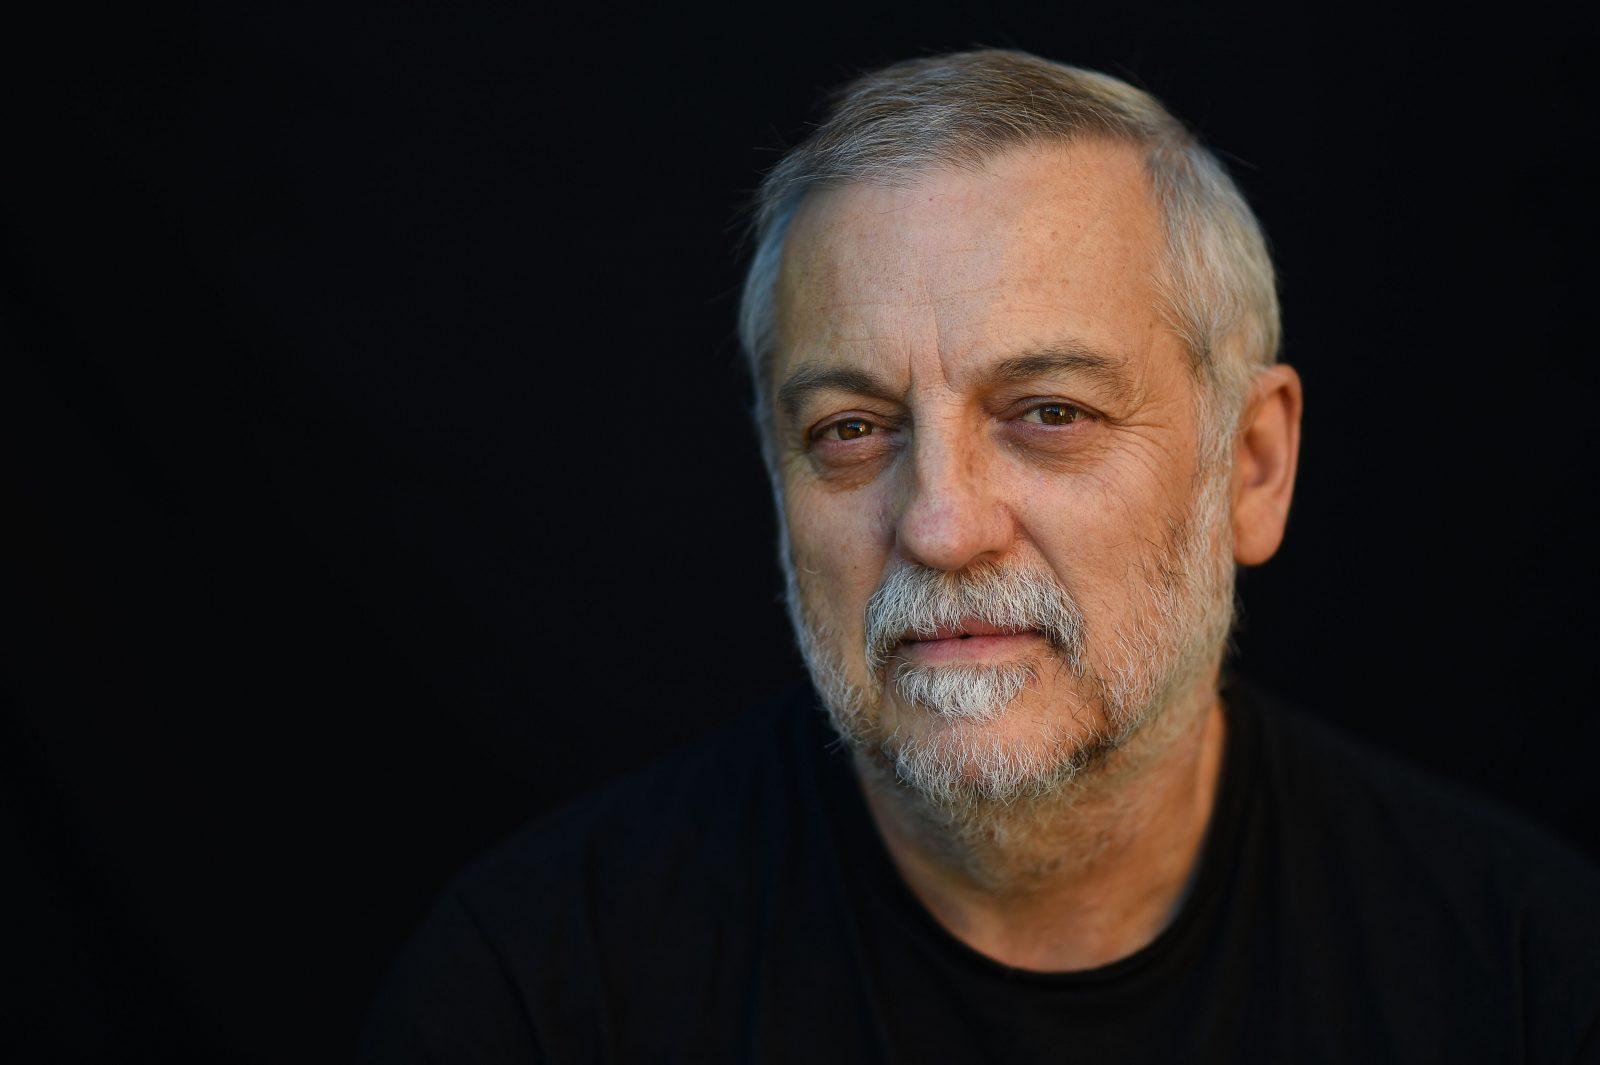 Portrait of Frank Prem - Poet and Author